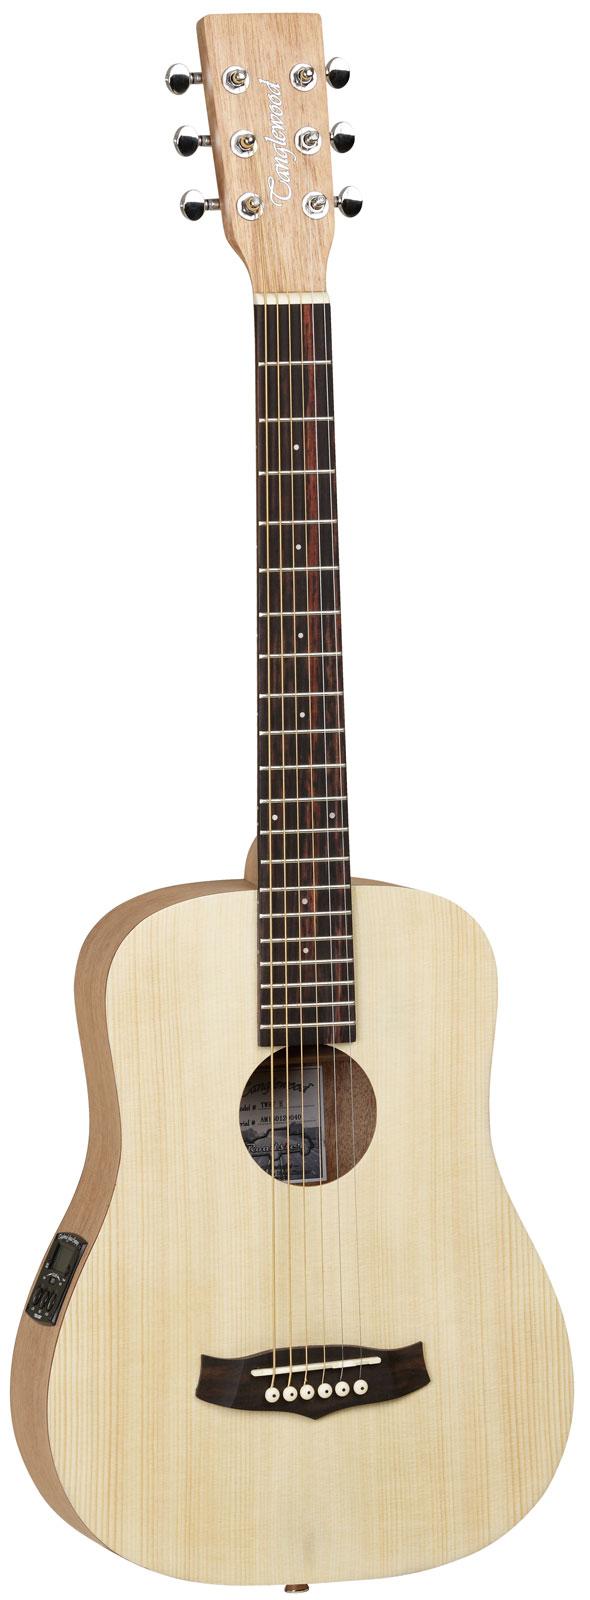 Guitare folk lectro tanglewood jfe naturelle brillante for Housse guitare folk